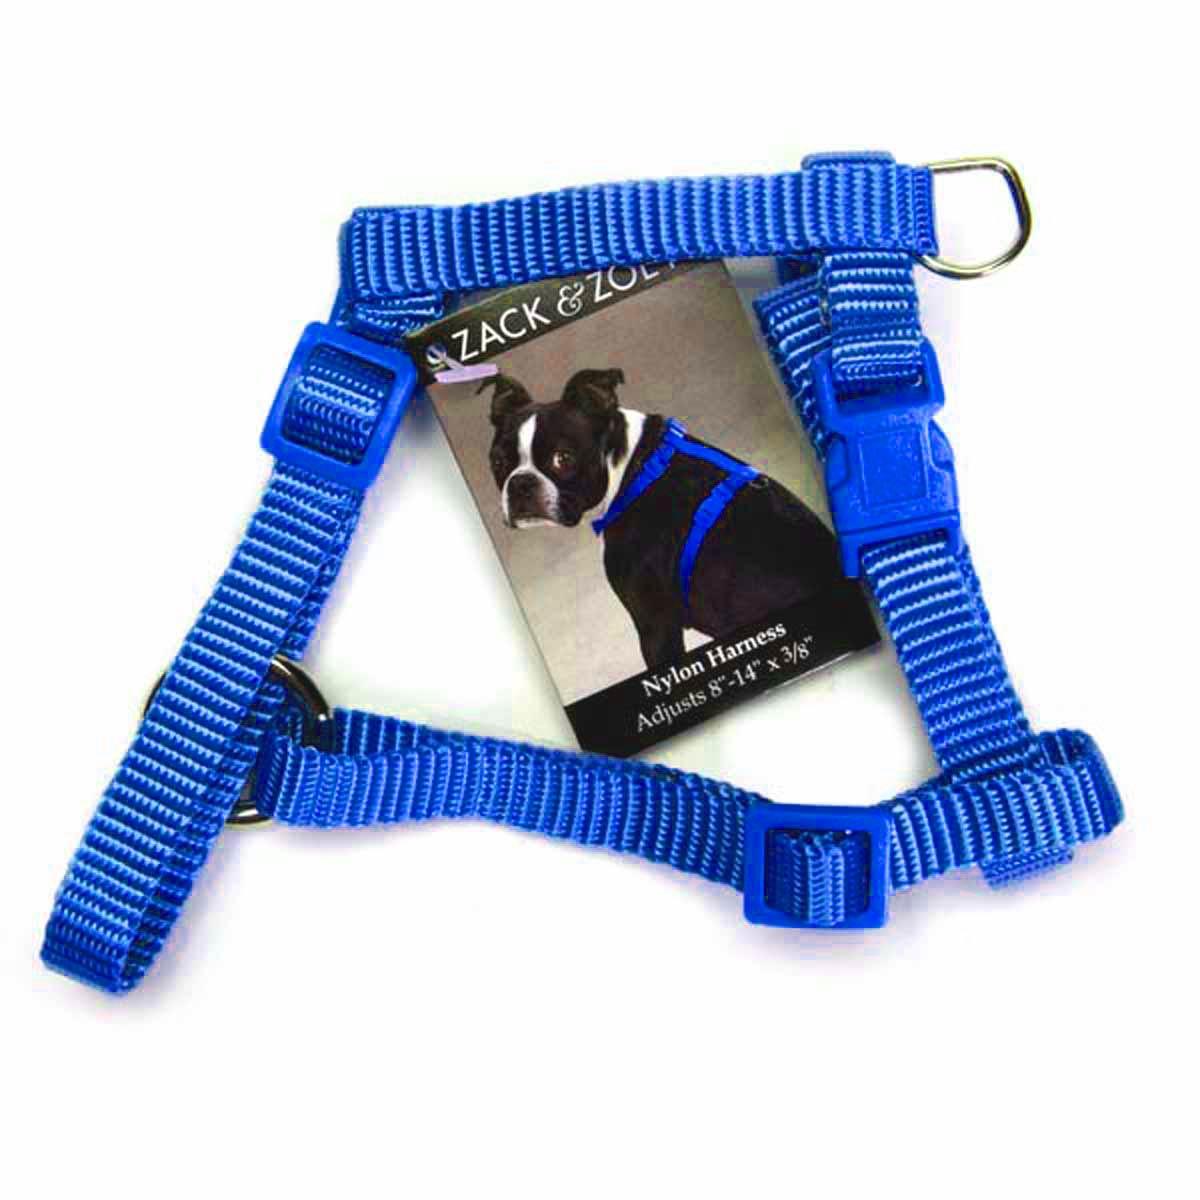 Nylon Dog Harness by Zack & Zoey - Nautical Blue